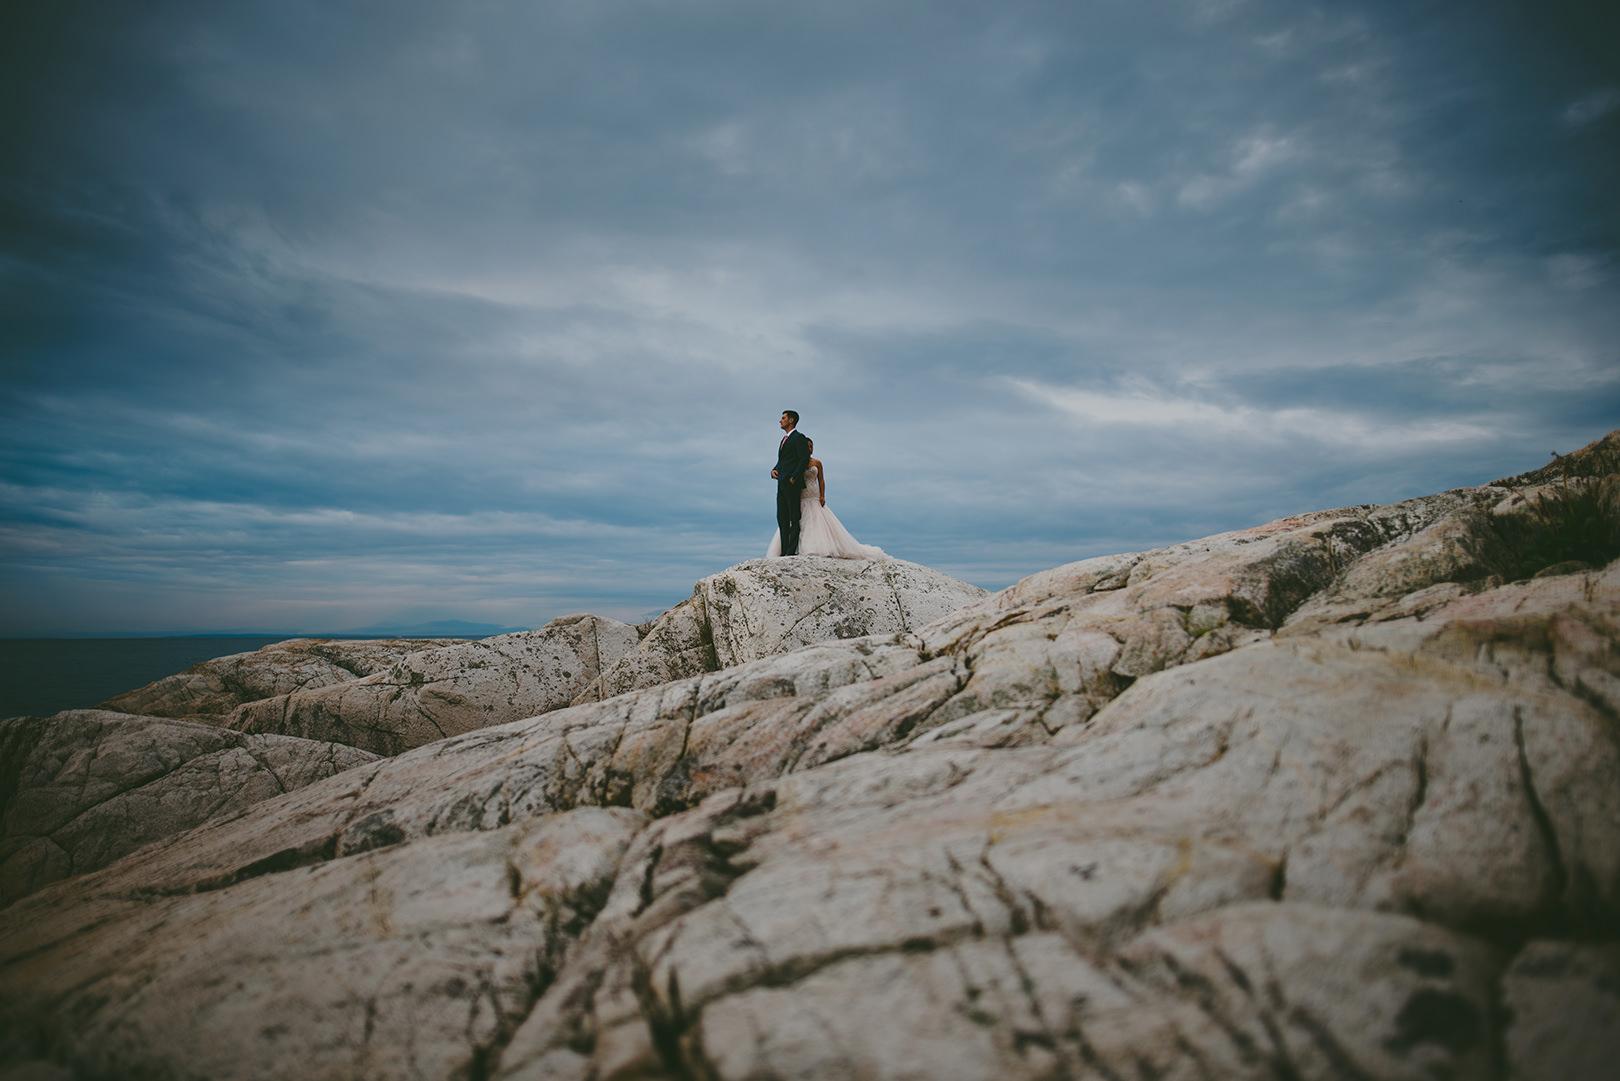 Spain Wedding Photographer - © Dallas Kolotylo Photography - 040